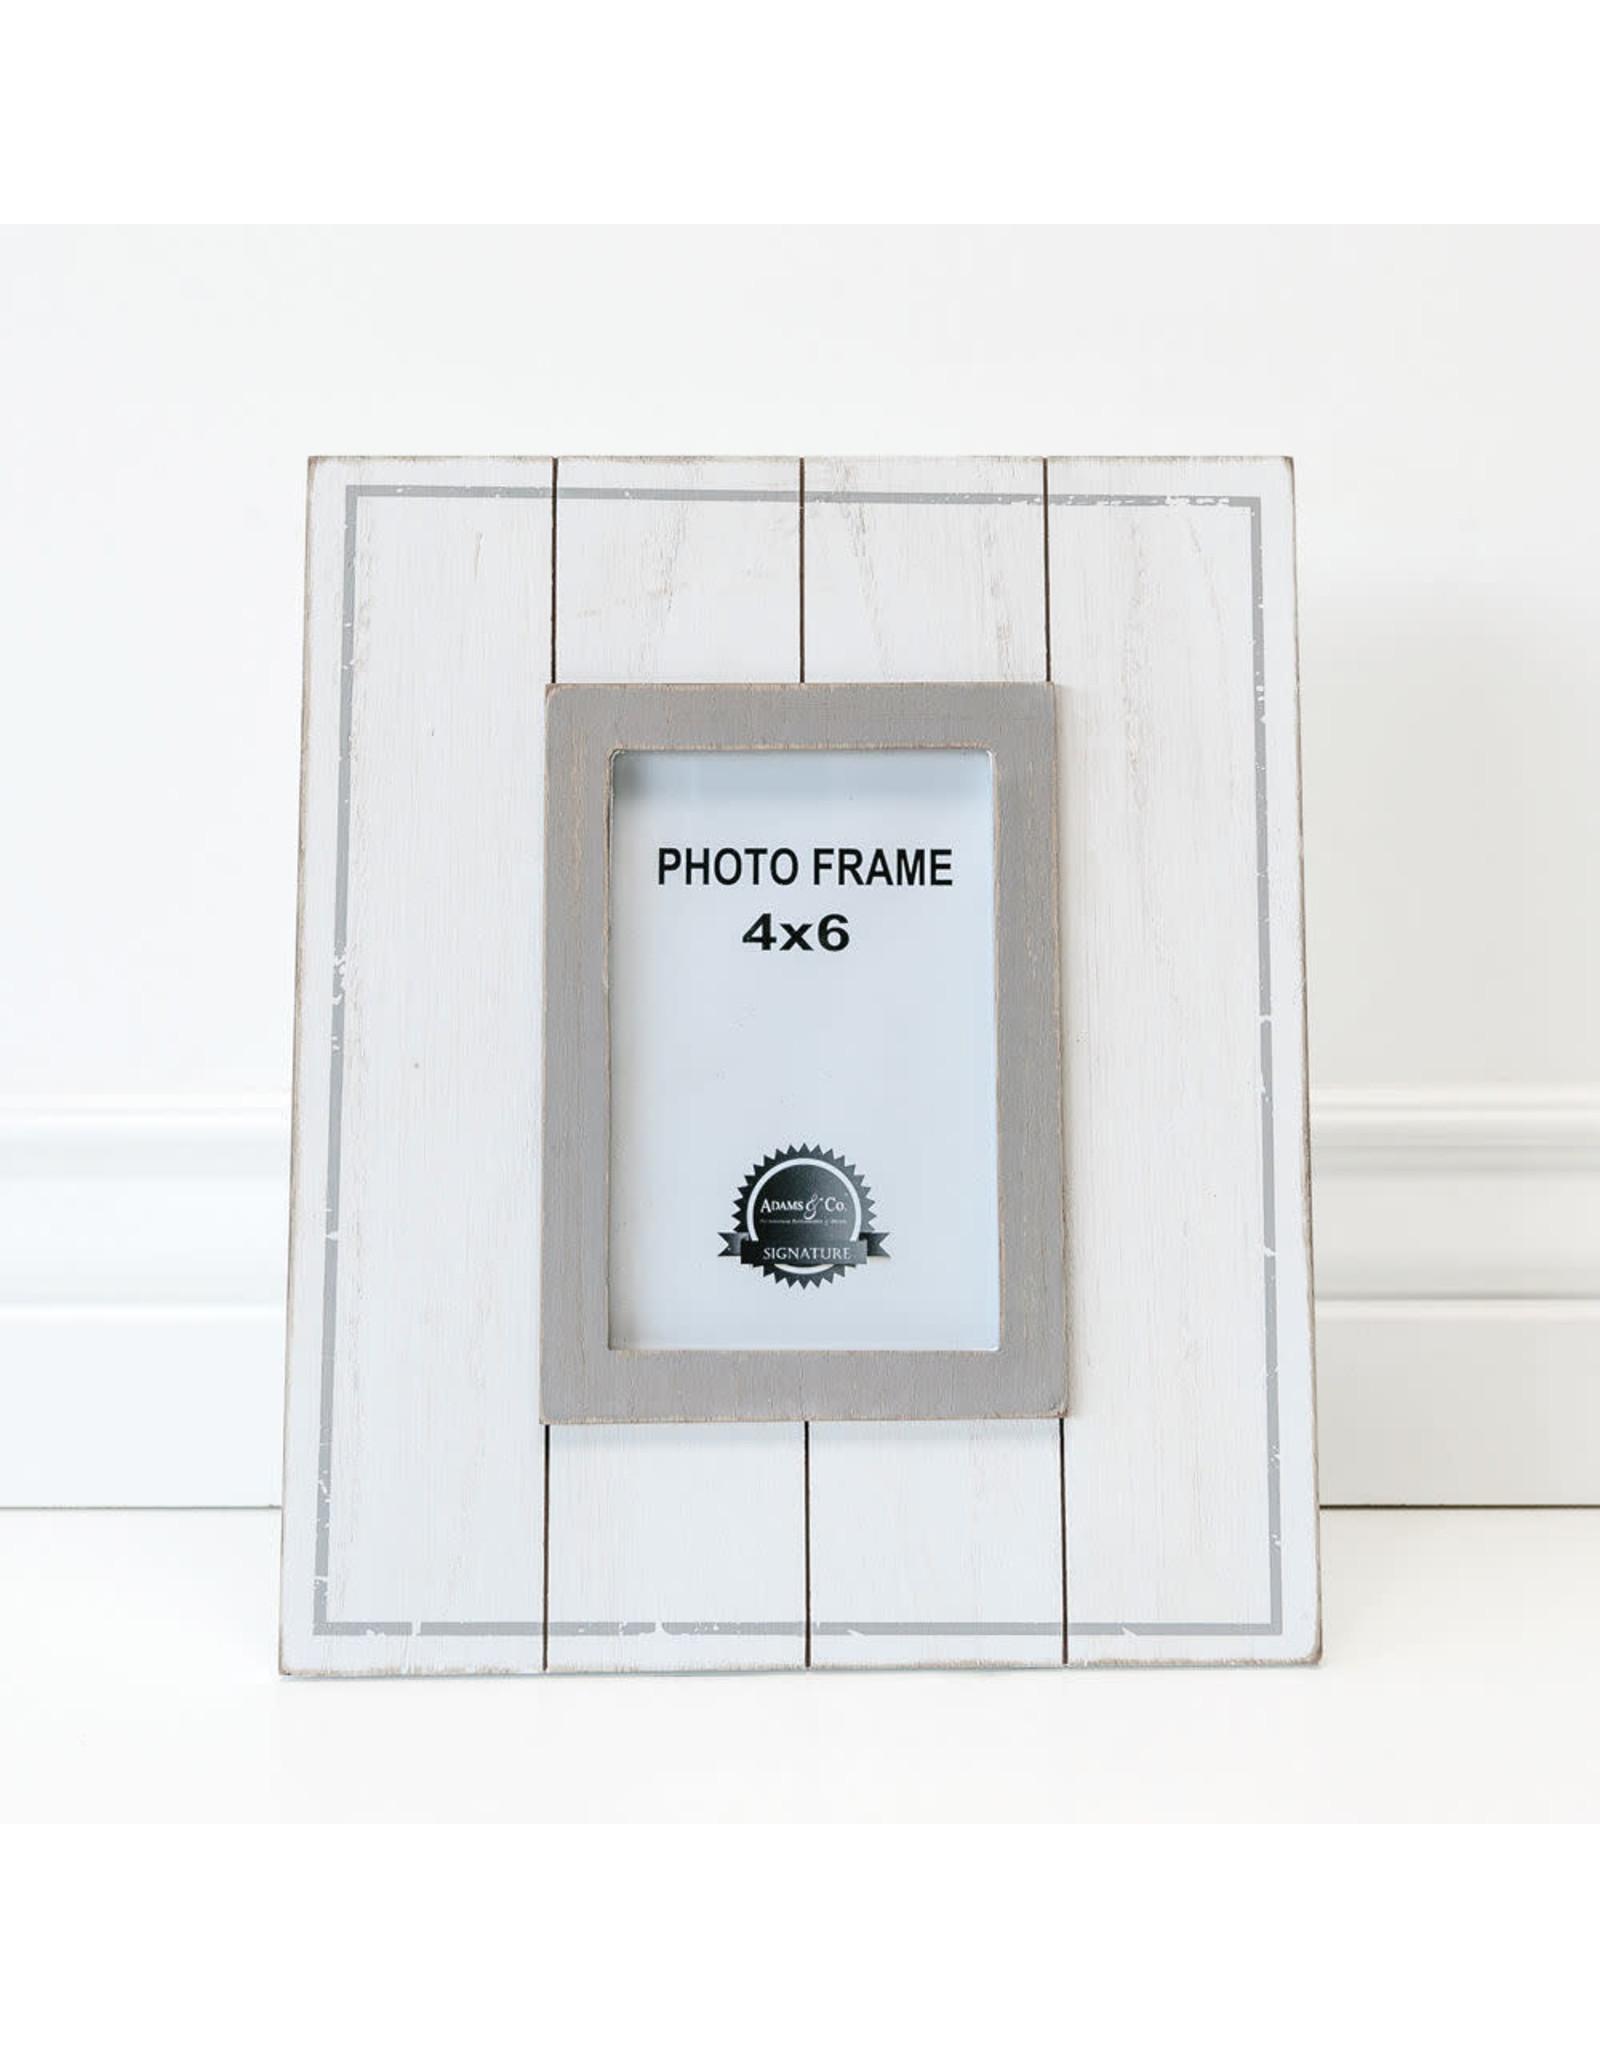 Adams & Co. Wood Photo Frame, White/Gray 4X6